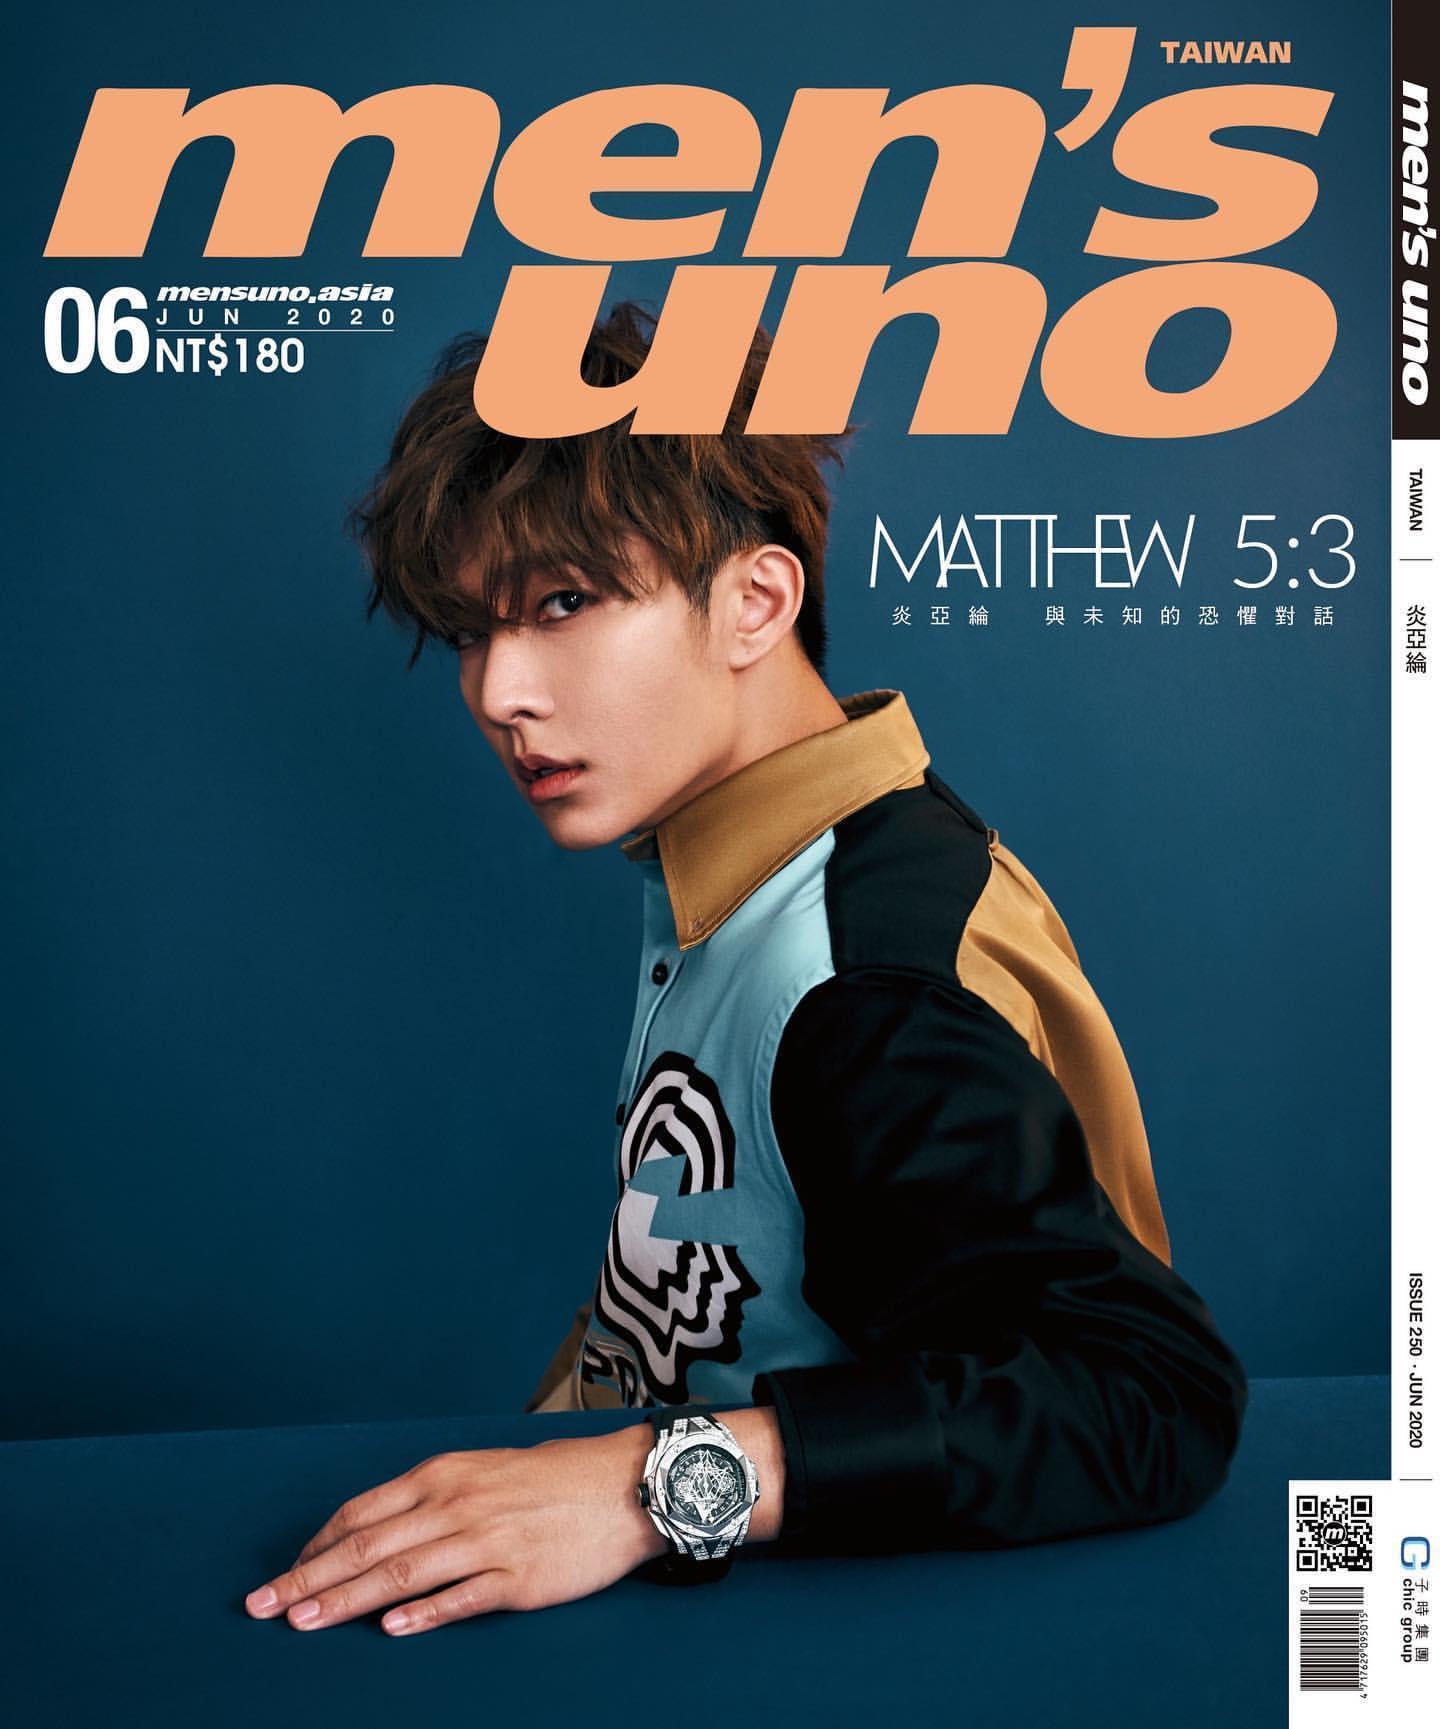 Aaron Yan - Men's Uno Taiwan Juin 2020